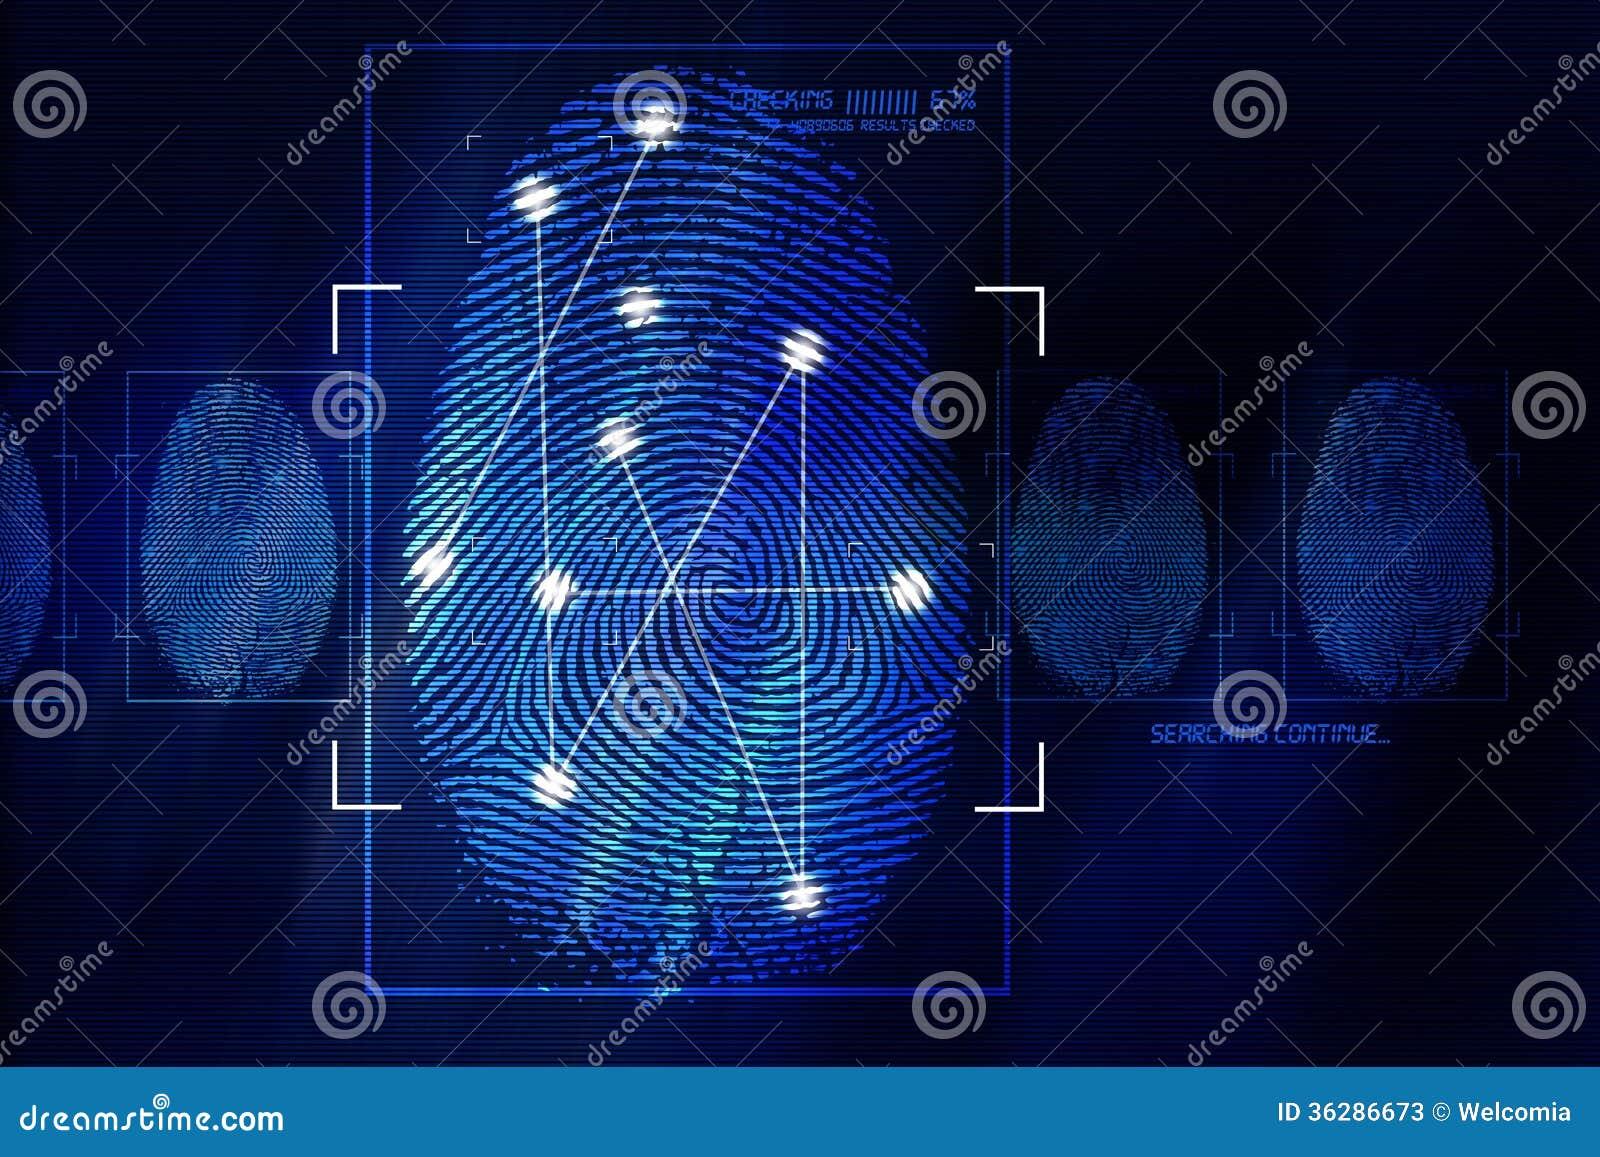 Fingerprint Scanning Technology Stock Photos - Image: 36286673